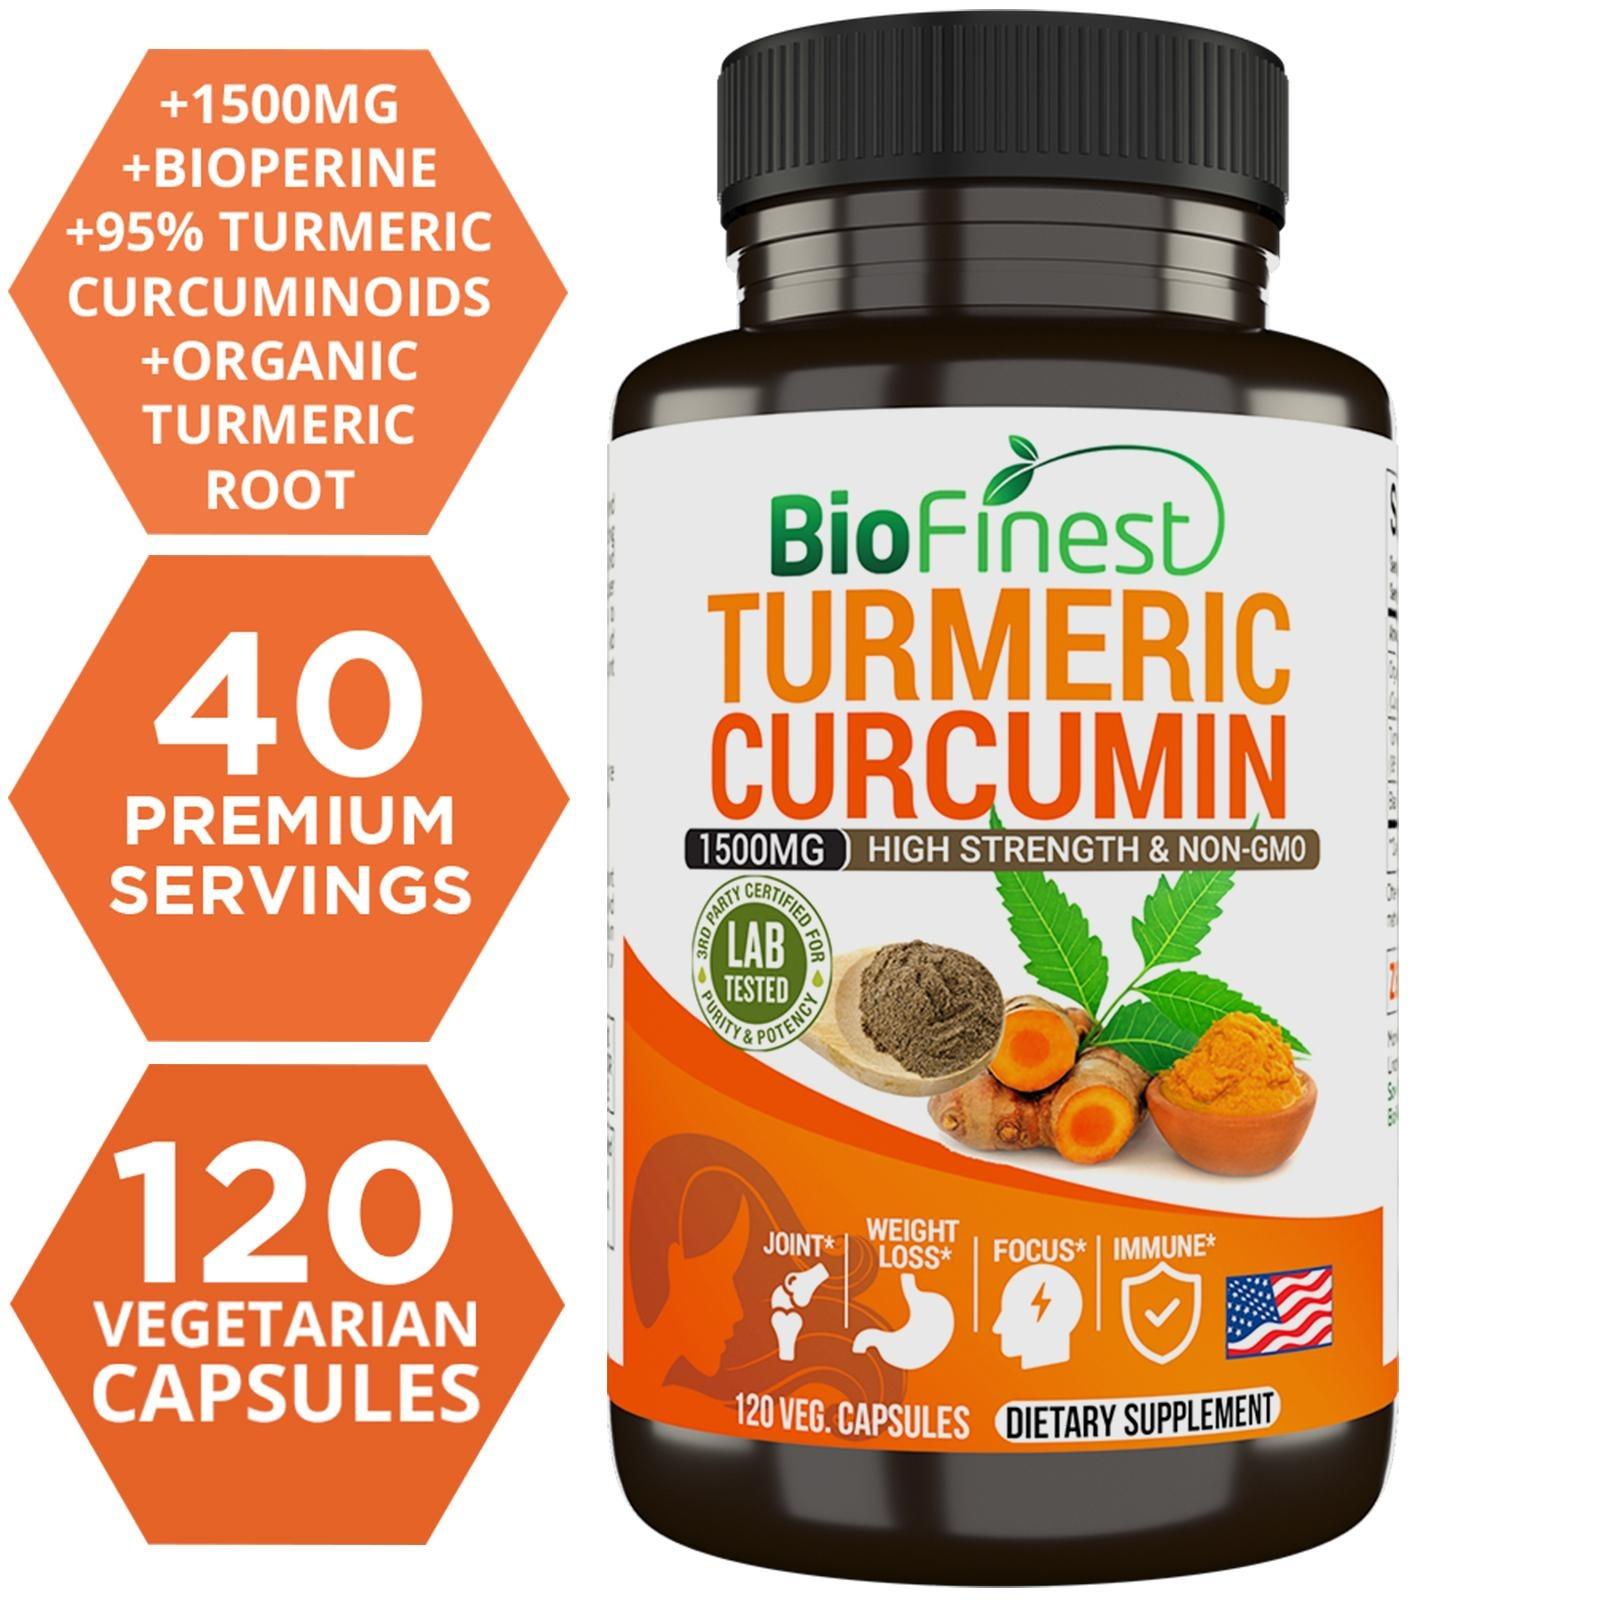 Biofinest Turmeric Curcumin Supplement